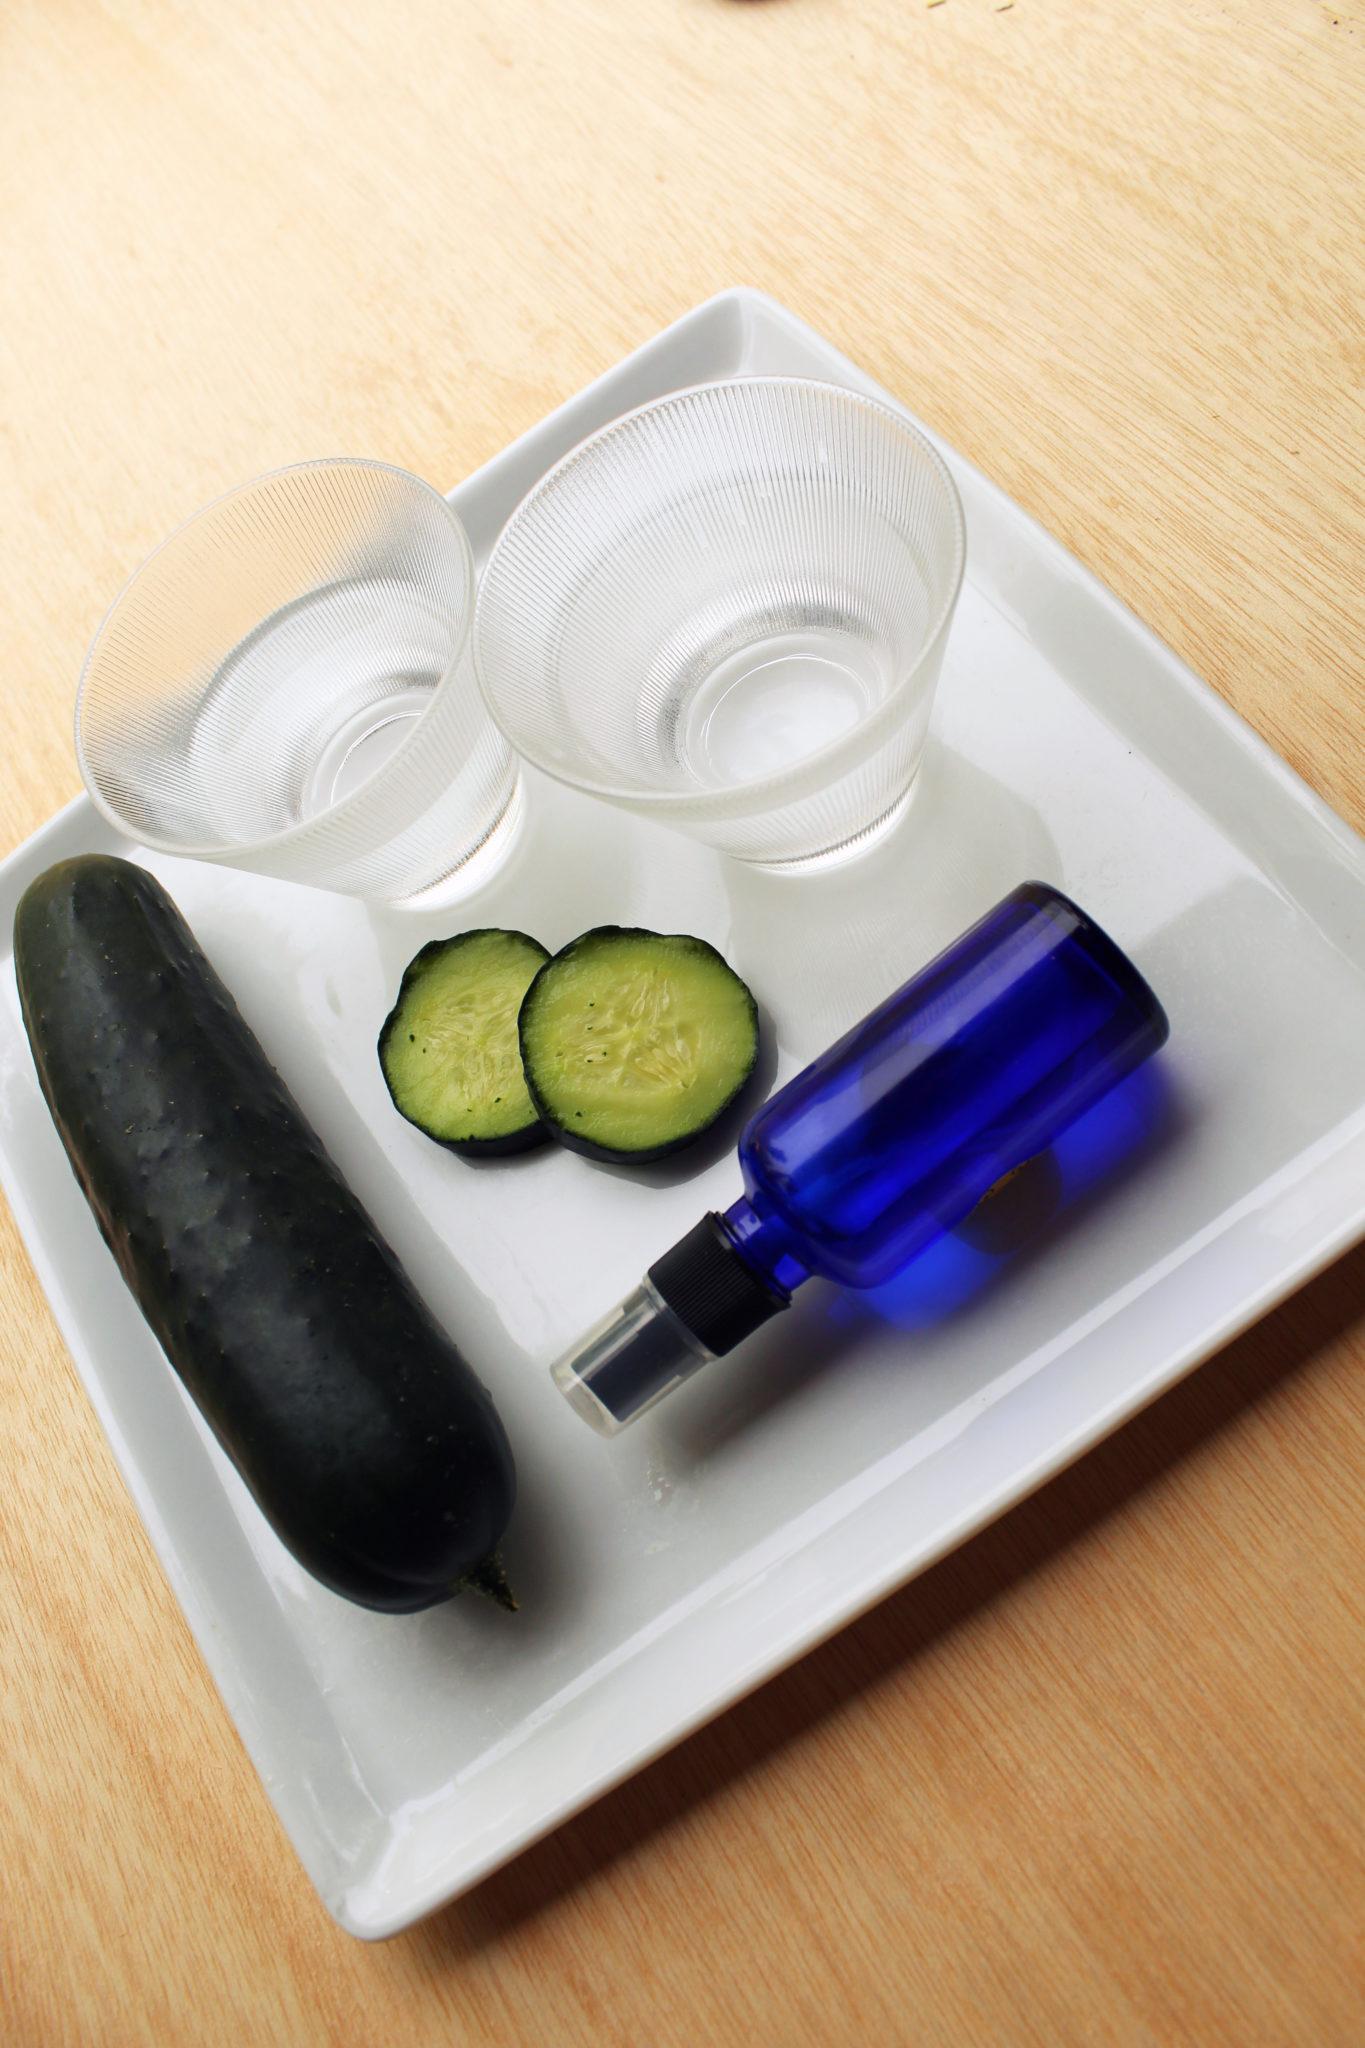 Make This Organic All Natural Cooling Cucumber Facial Toner with this All Natural DIY Recipe